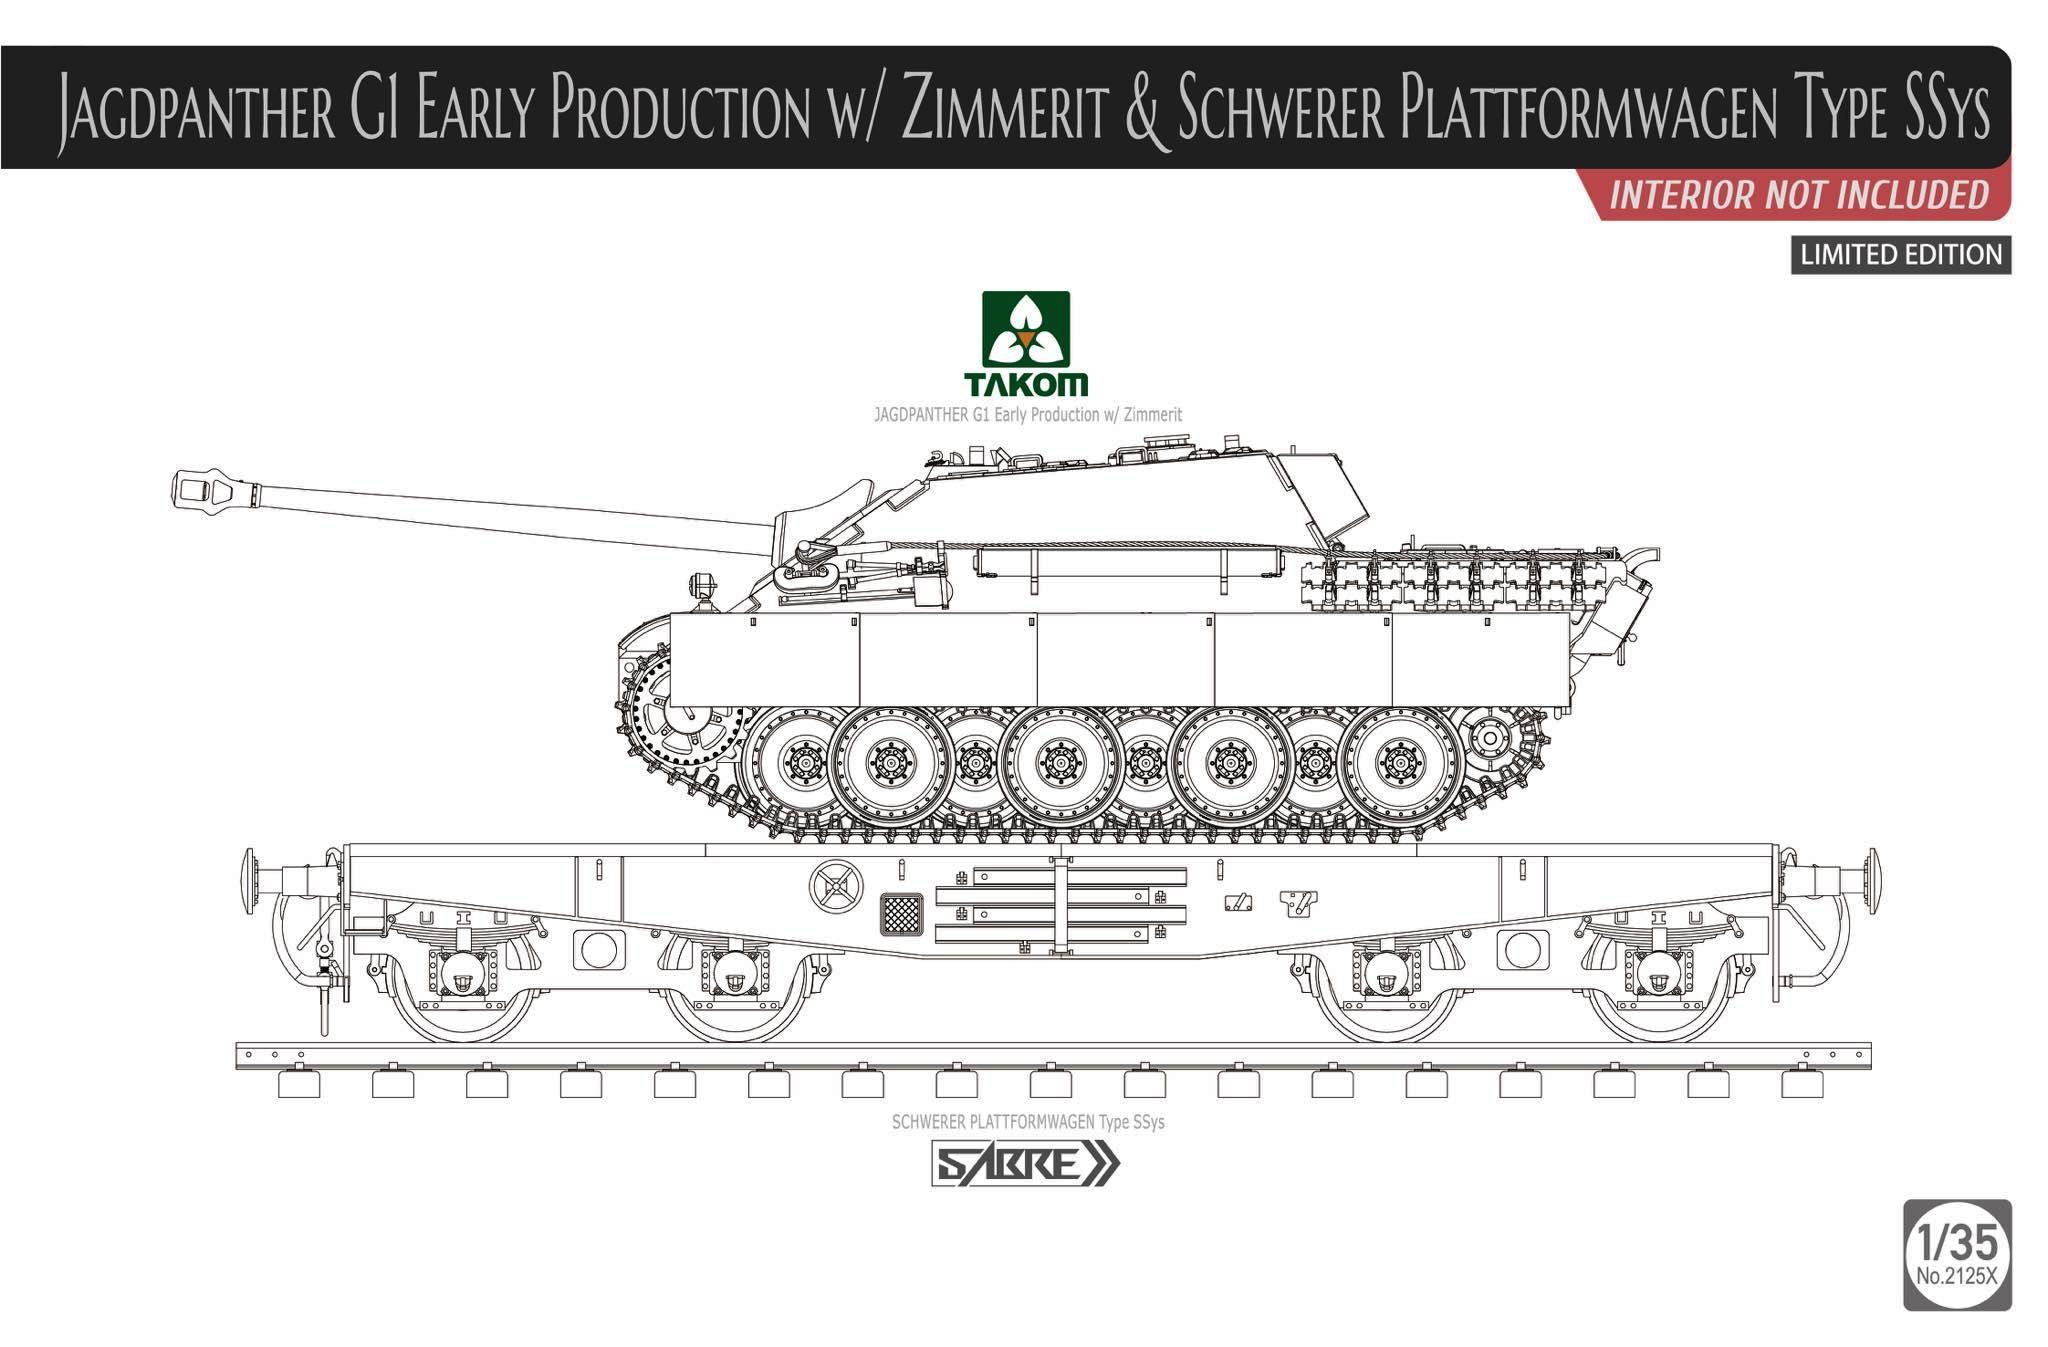 TAKOM # 2125X 1-35 Jagdpanther G1 Early Production wZimmerit & Schwerer Plattformwagen Type SSYS by Sabre.jpg